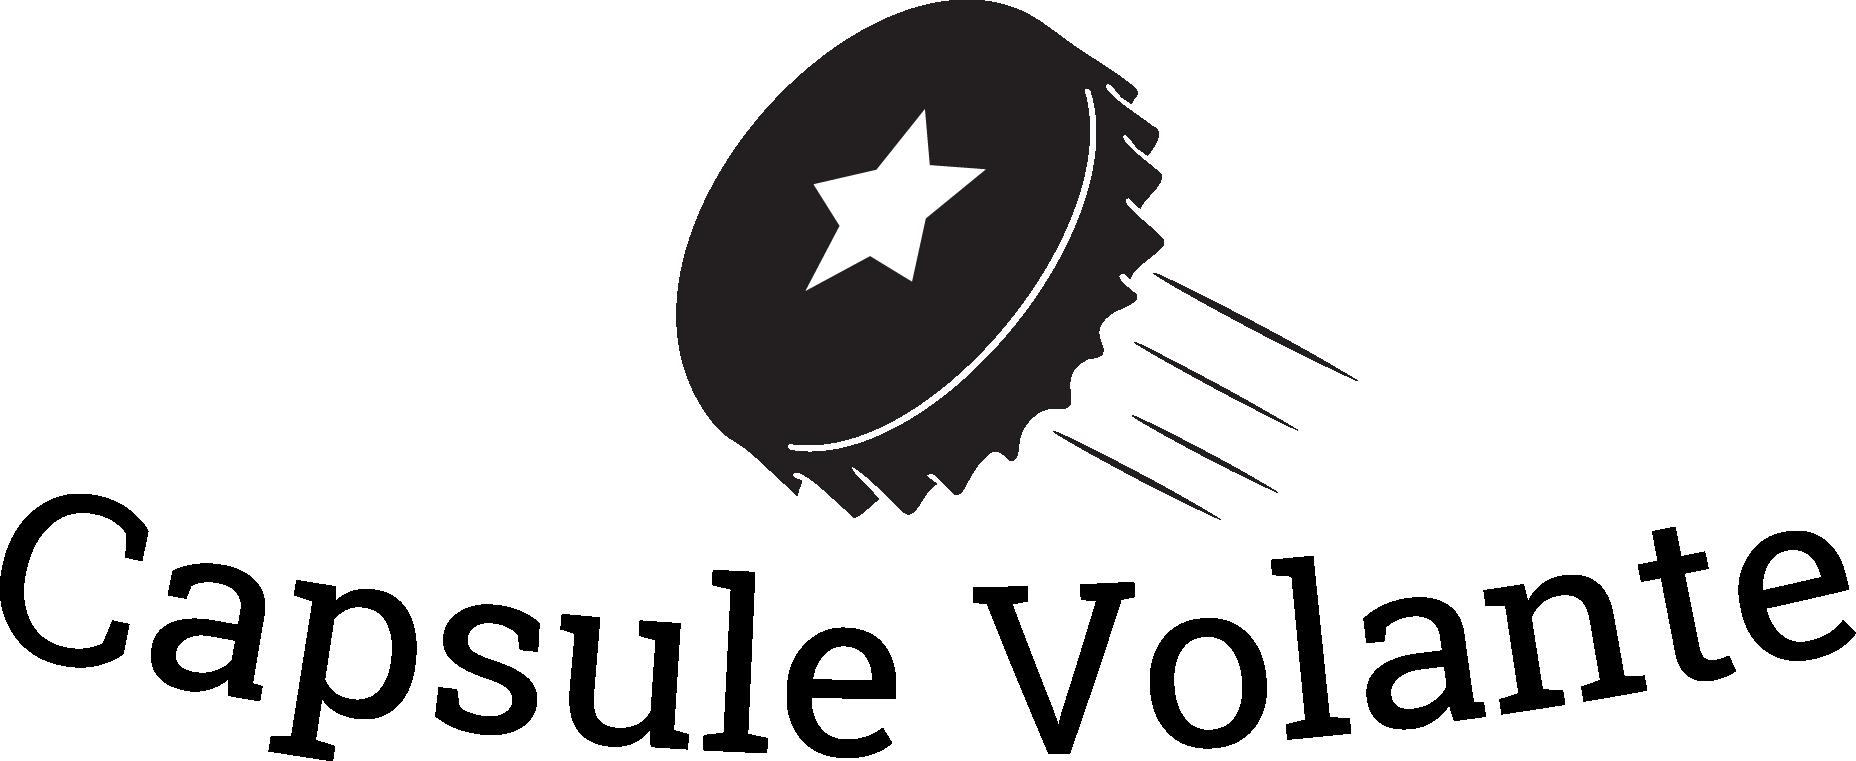 Capsule volante